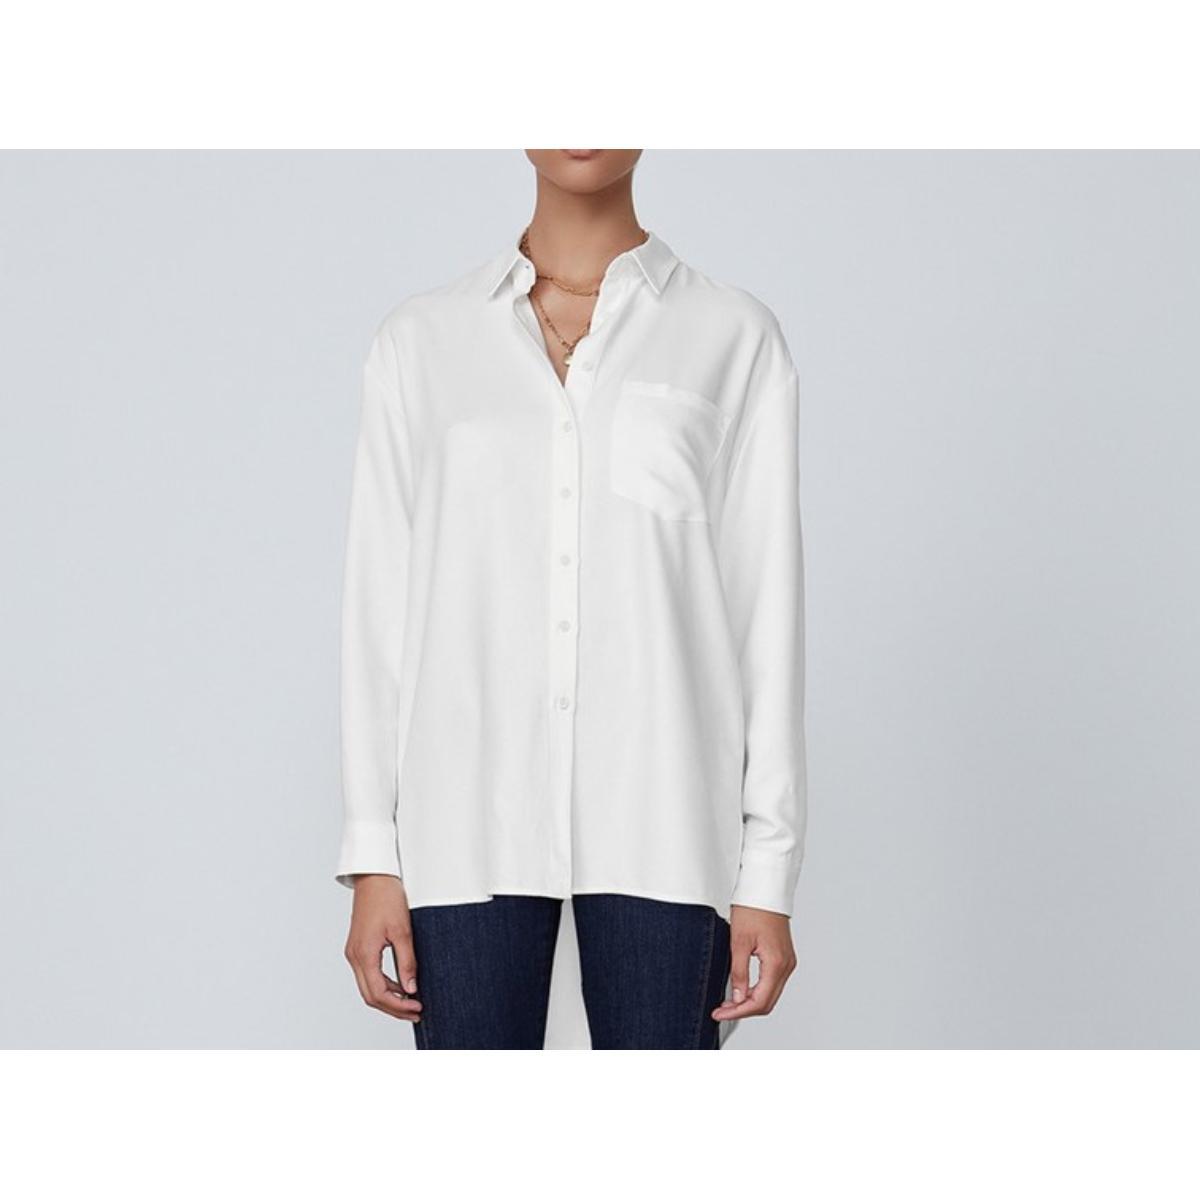 Camisa Feminina Dzarm Zimn Nmcen Branco